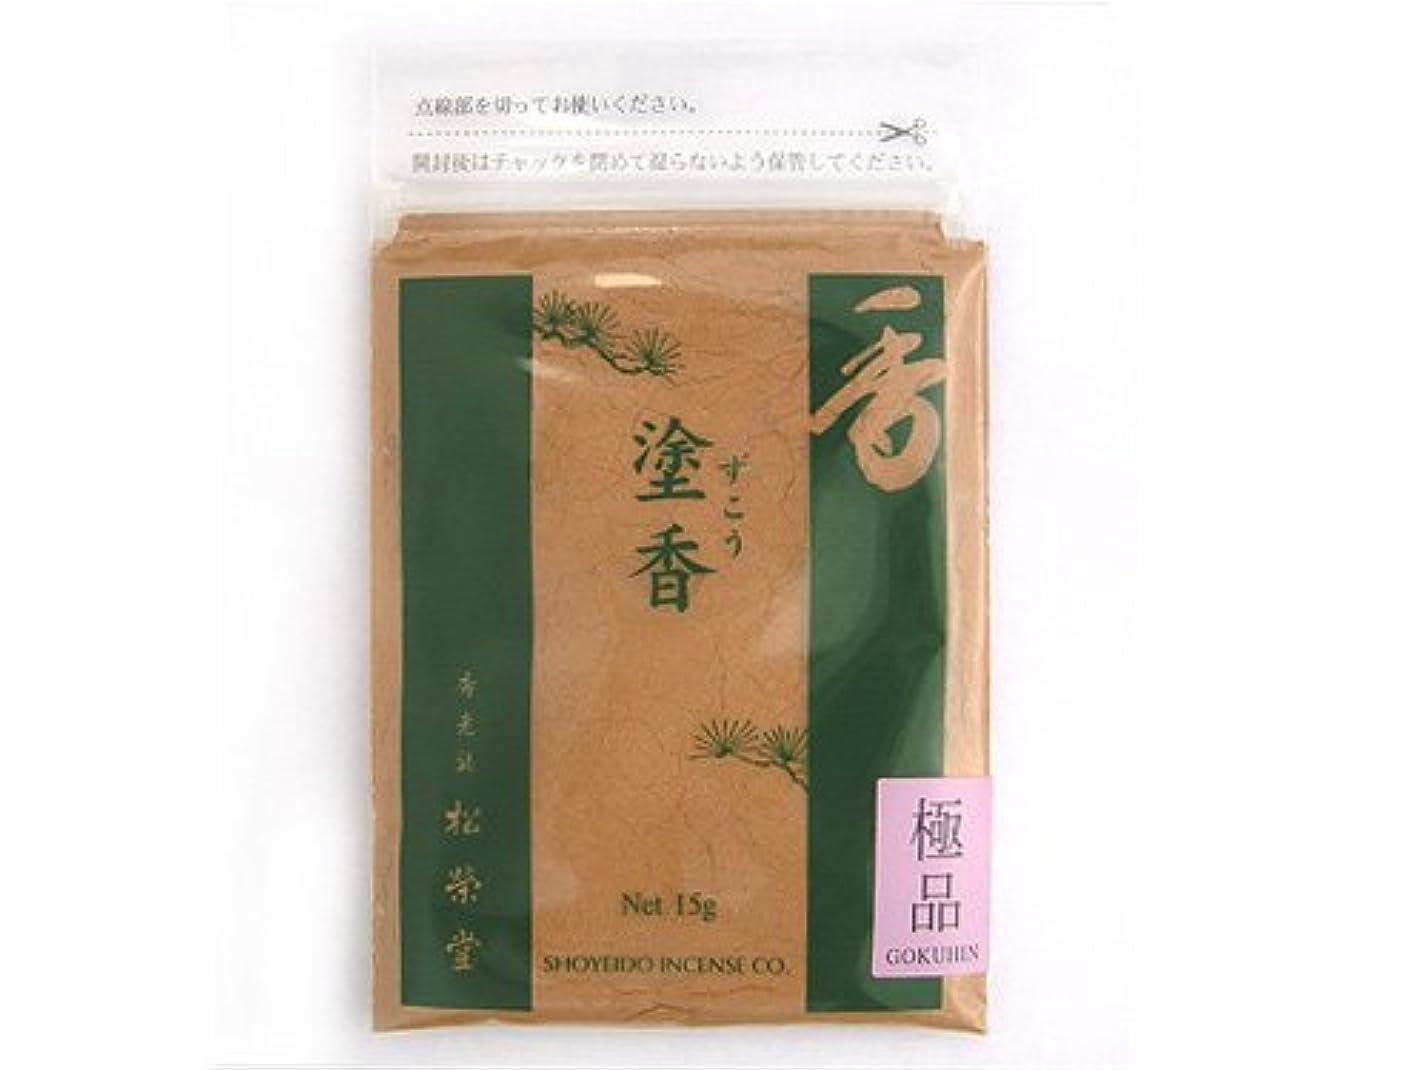 正午擬人化褐色松栄堂のお香 極品塗香 15g